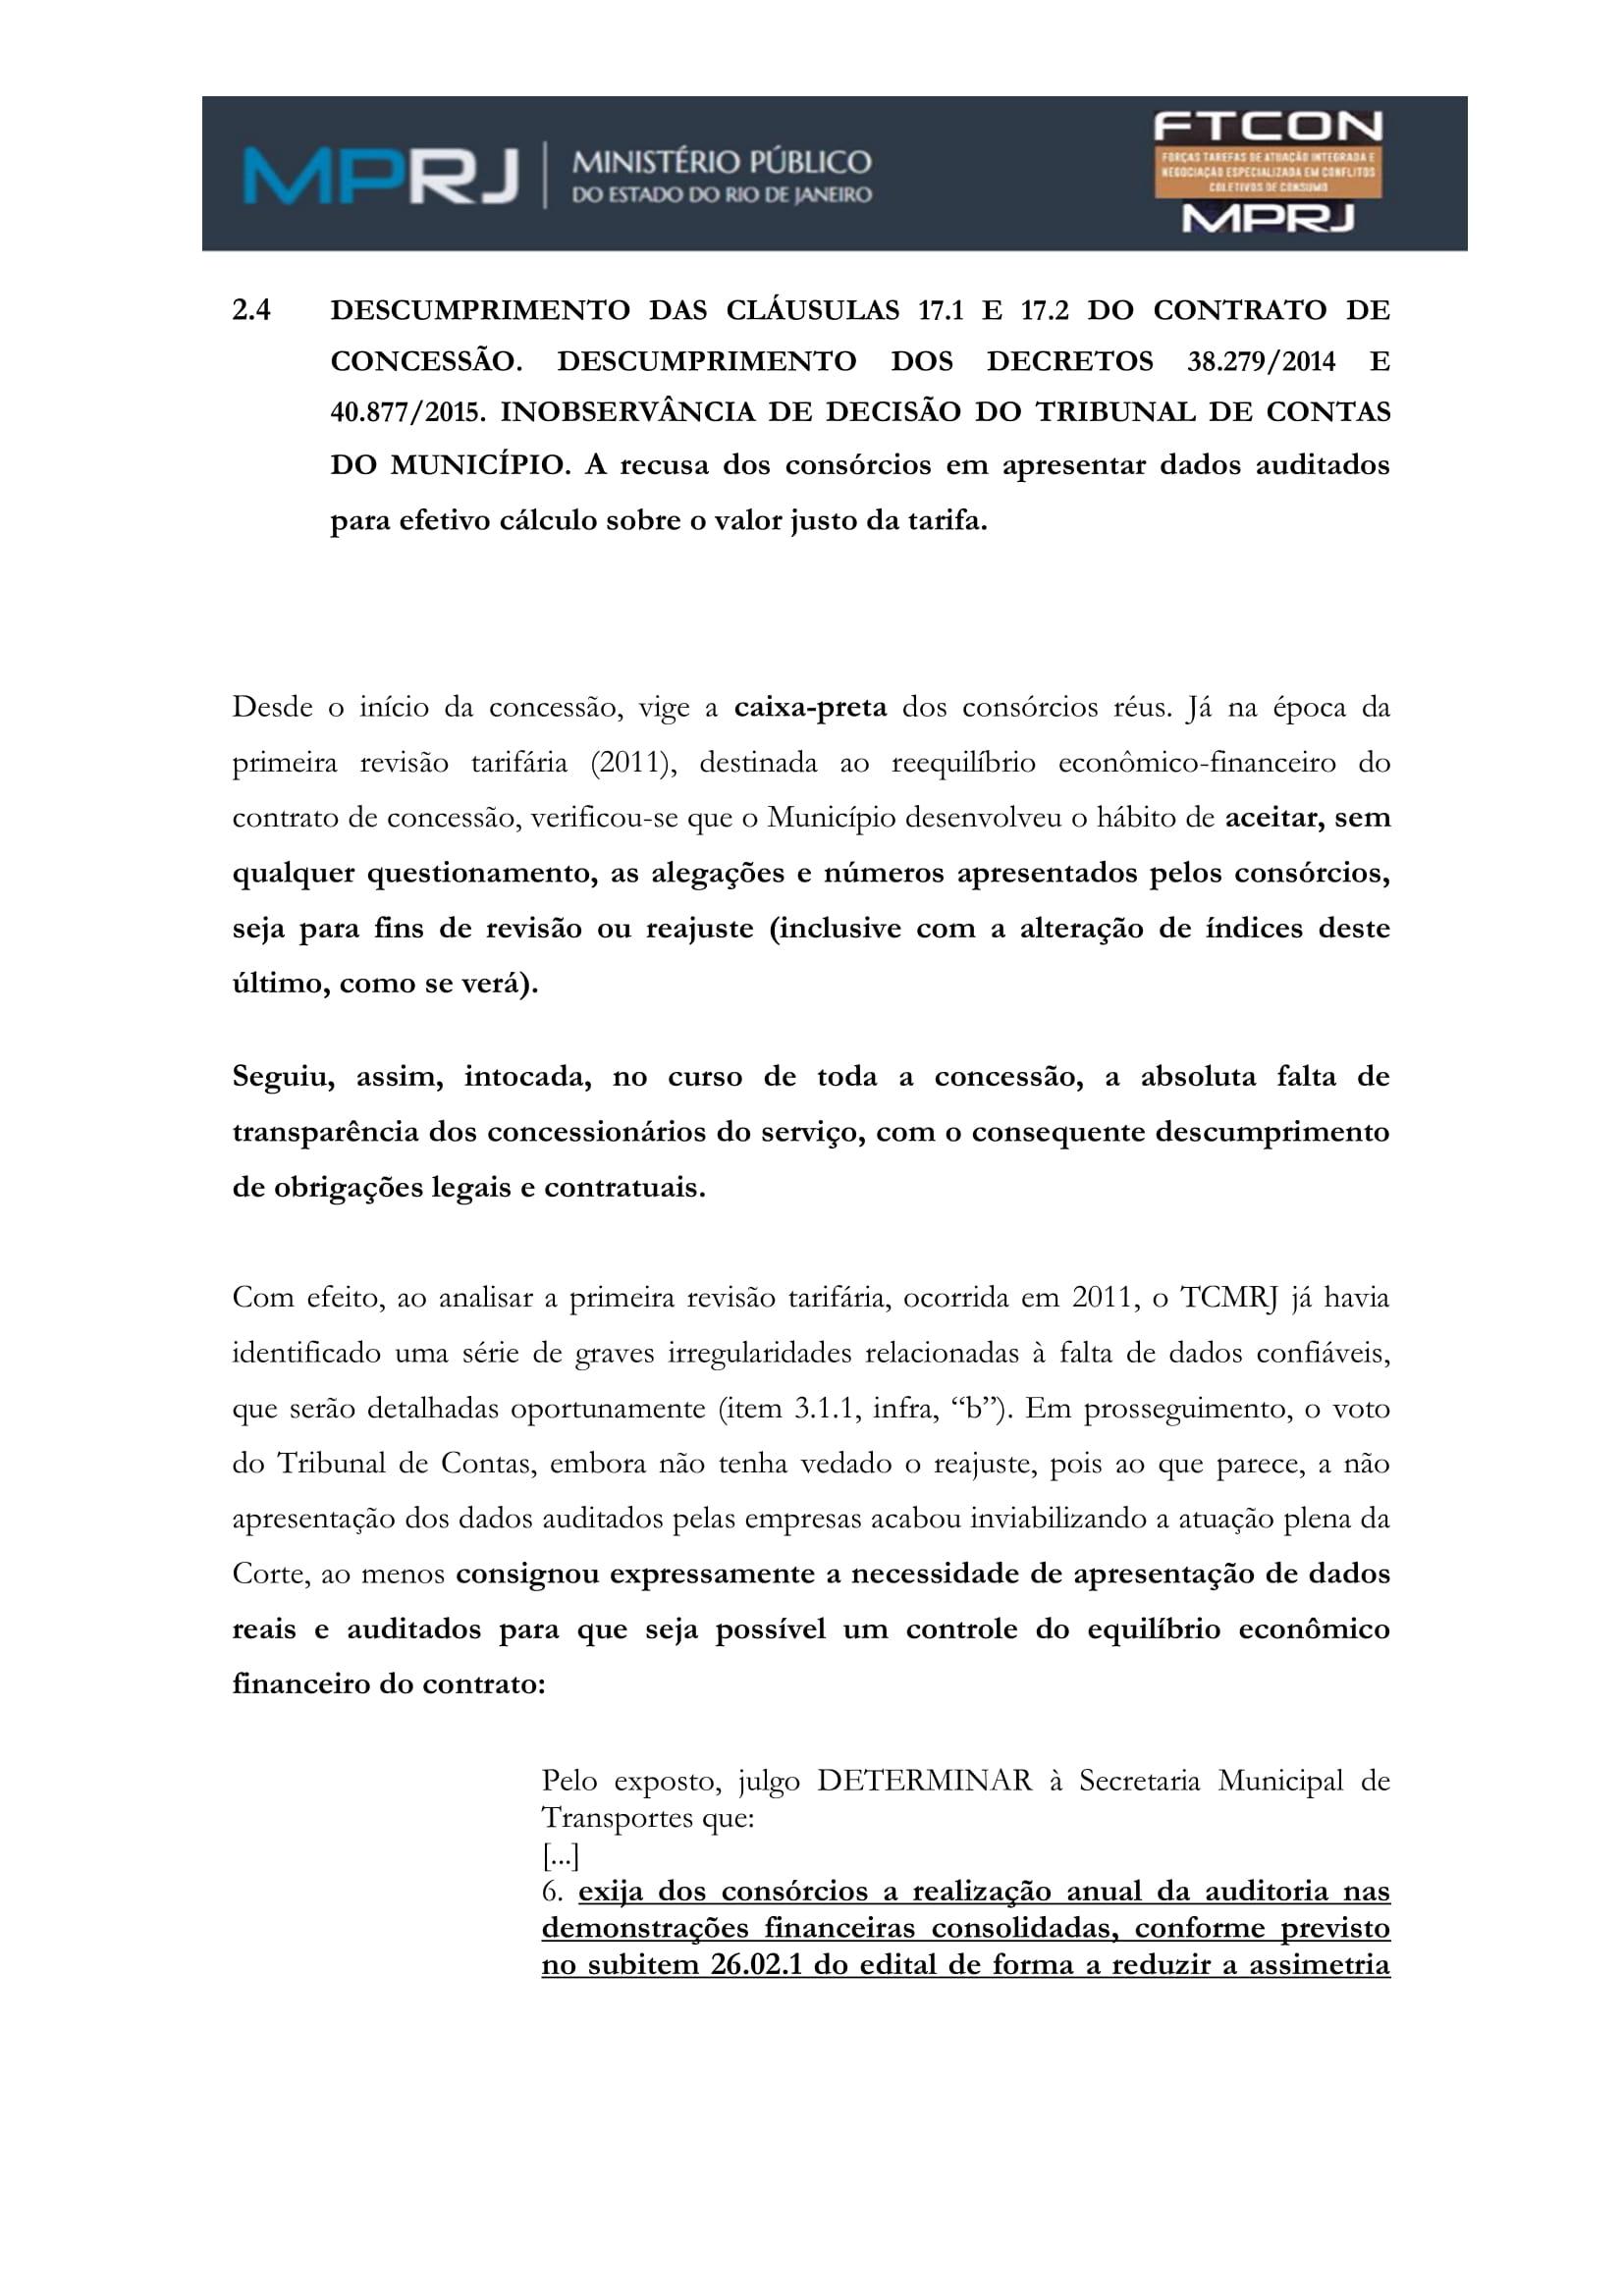 acp_caducidade_onibus_dr_rt-046